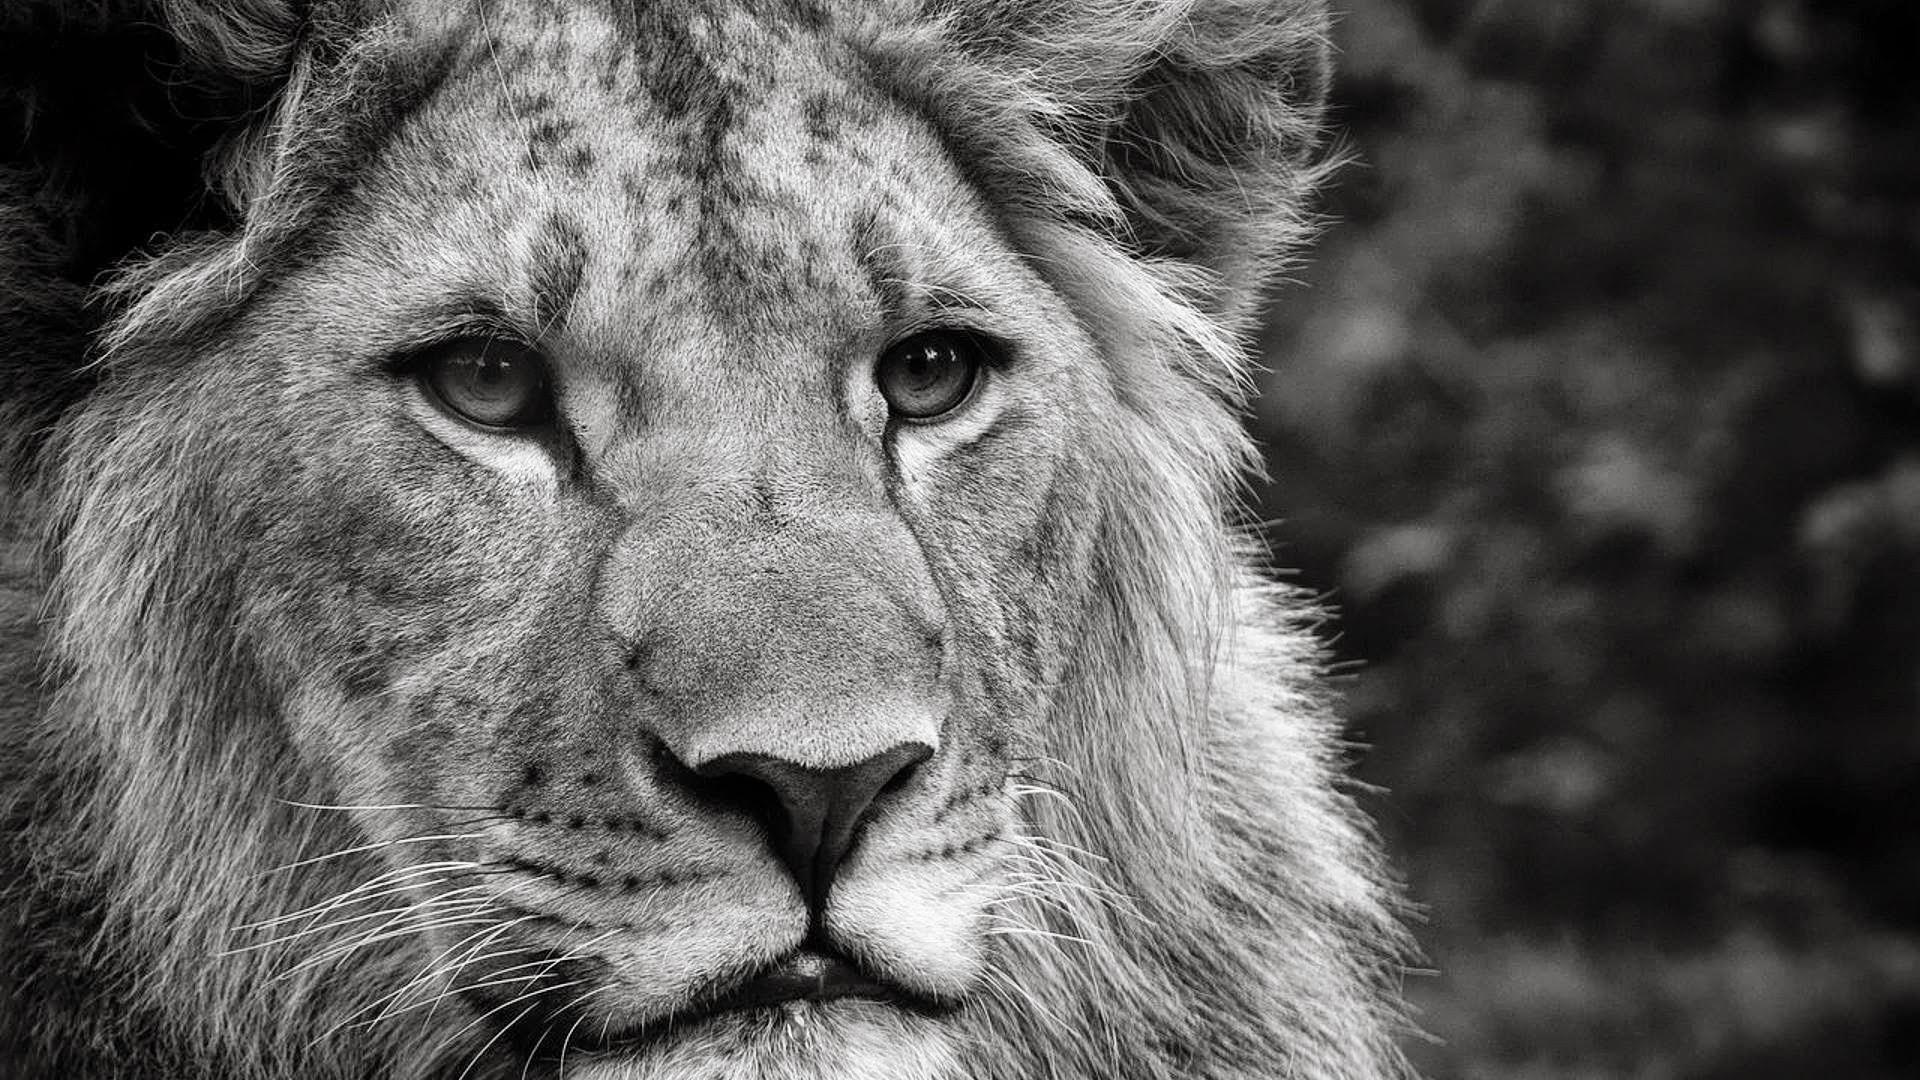 Black and white lion wallpaper